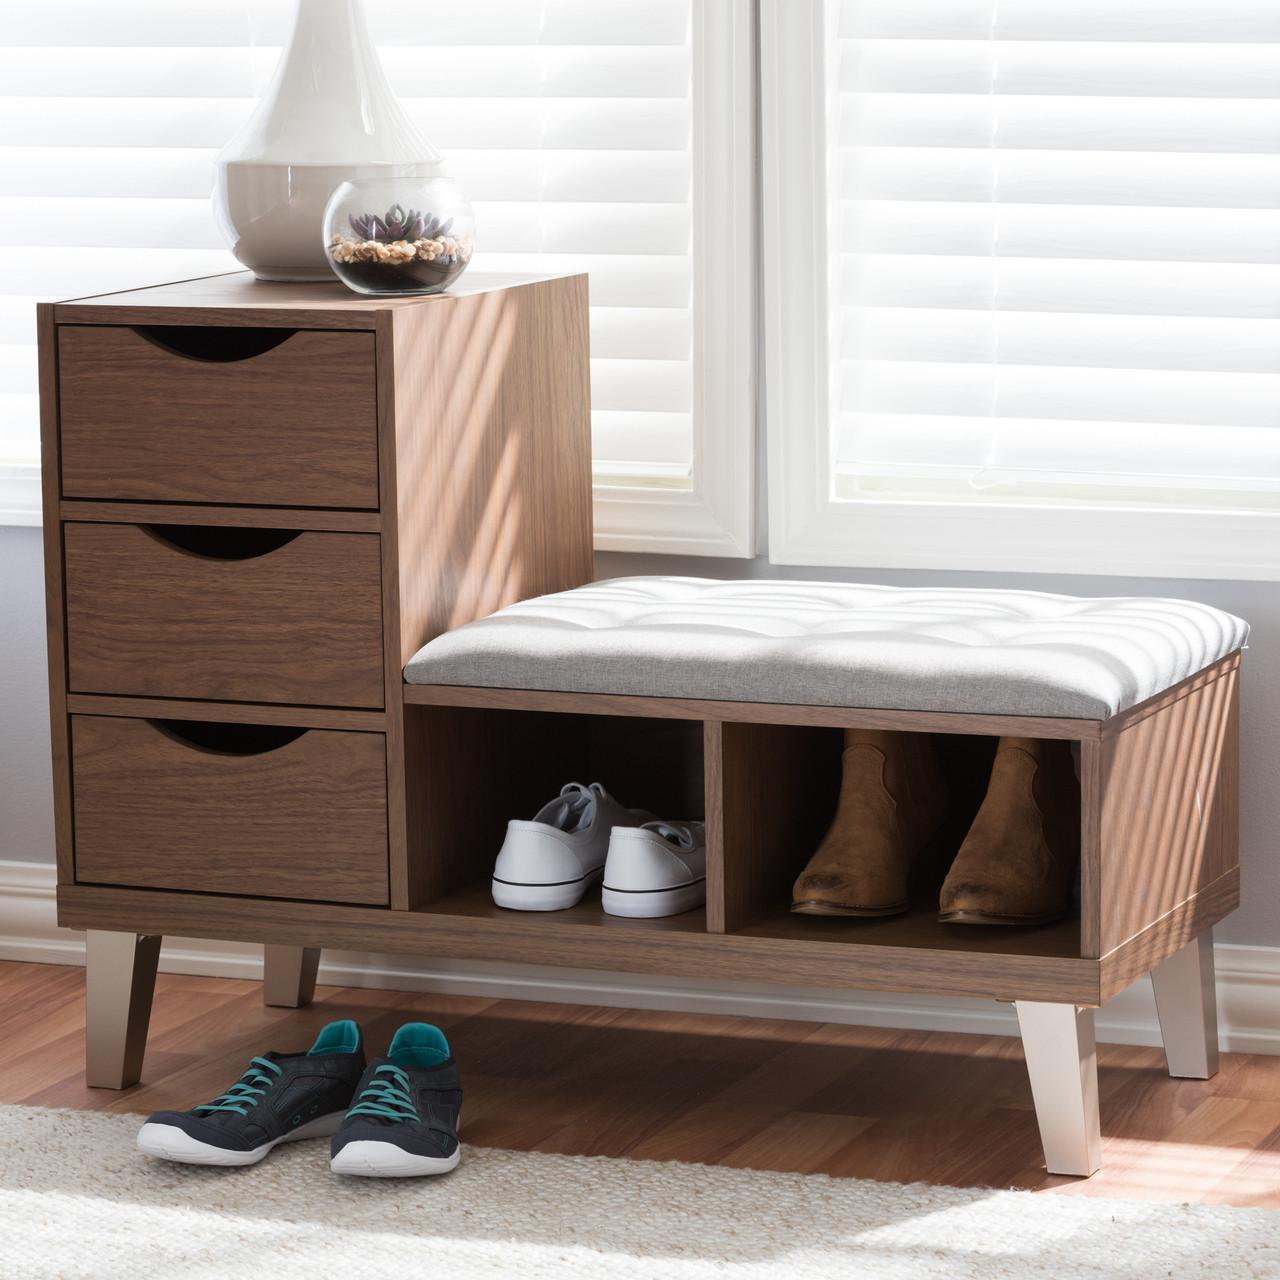 Baxton Studio Arielle Modern And Contemporary Walnut Wood 3 Drawer